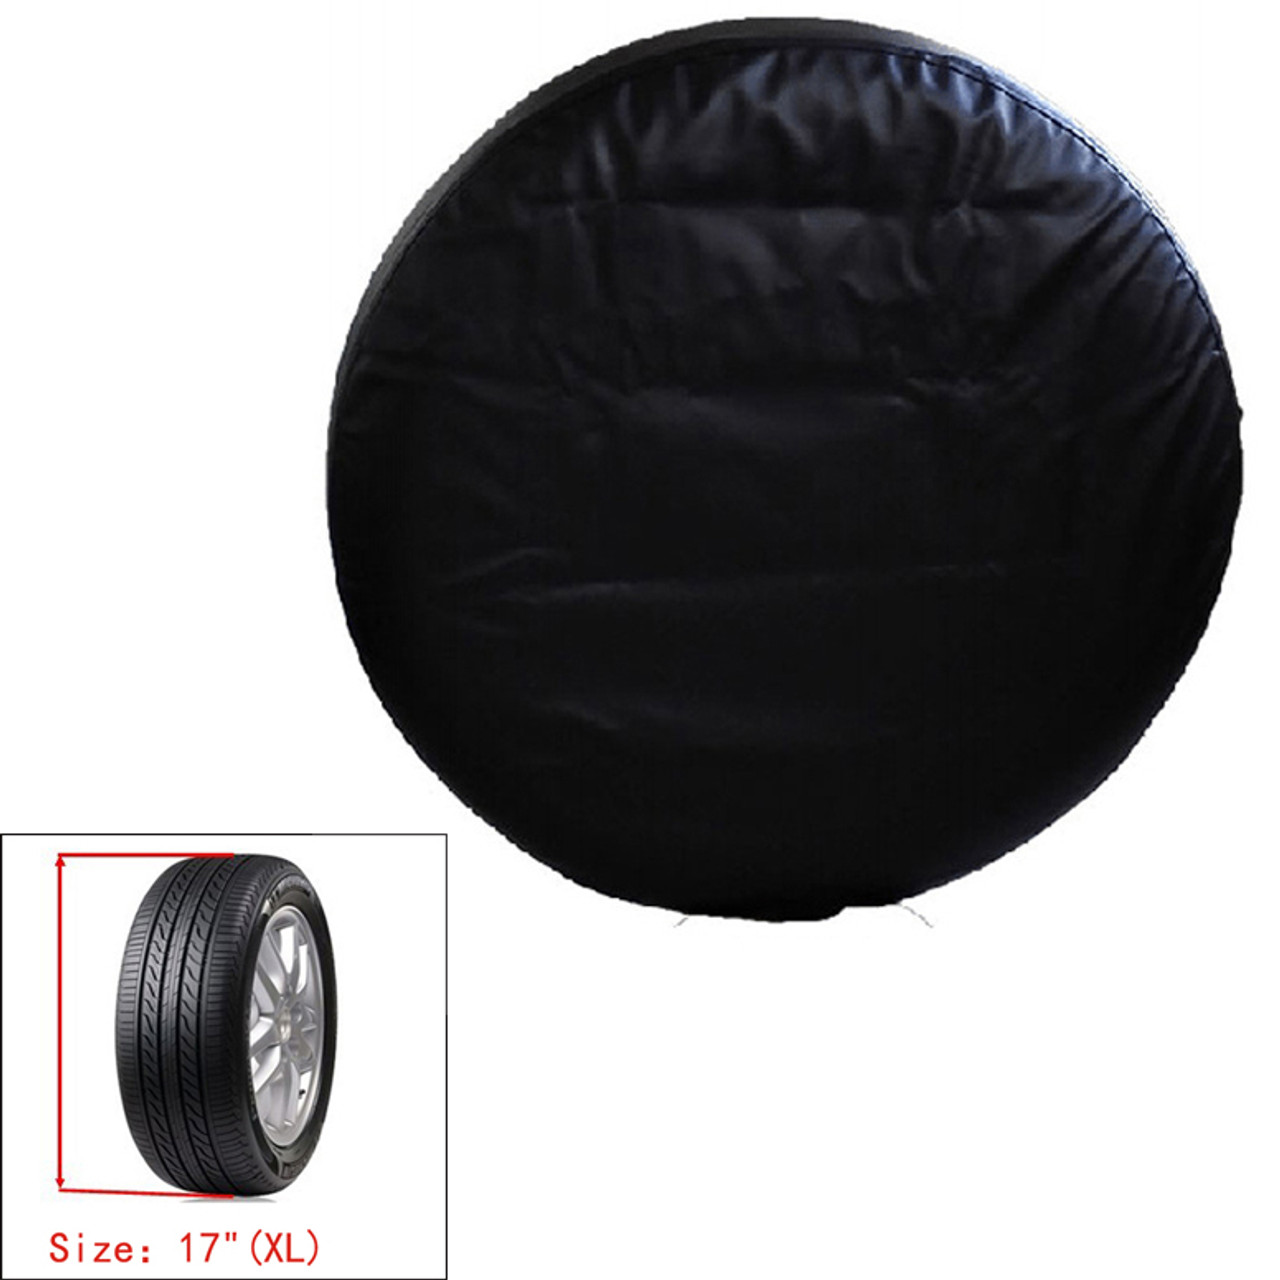 "17"" XL PU Spare Wheel Tire Cover Storage Bag Heavy Duty Vinyl, Black"